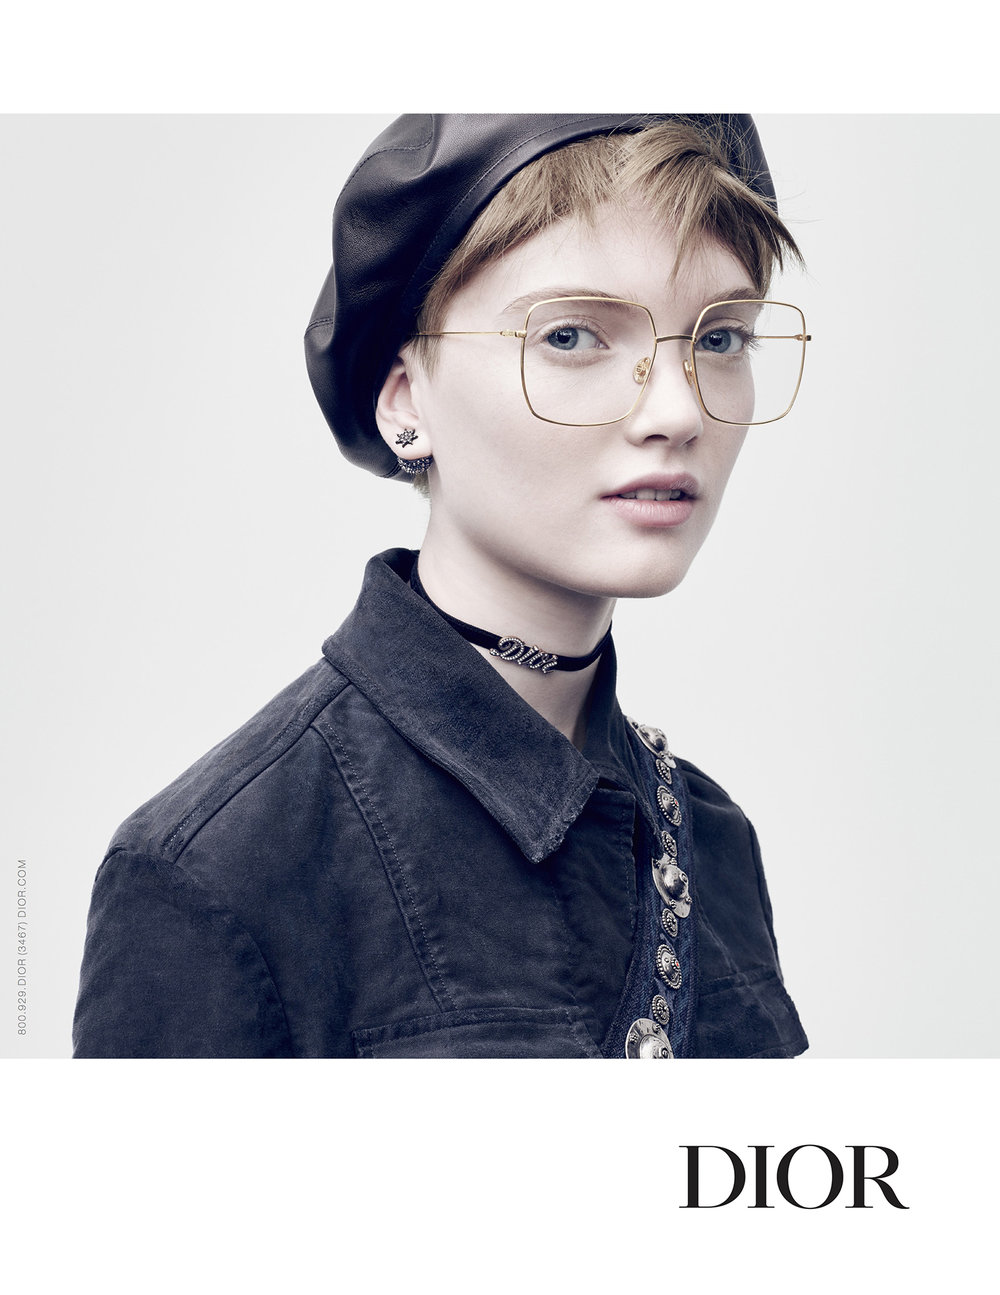 Dior Eyewear Fall/Winter 2017